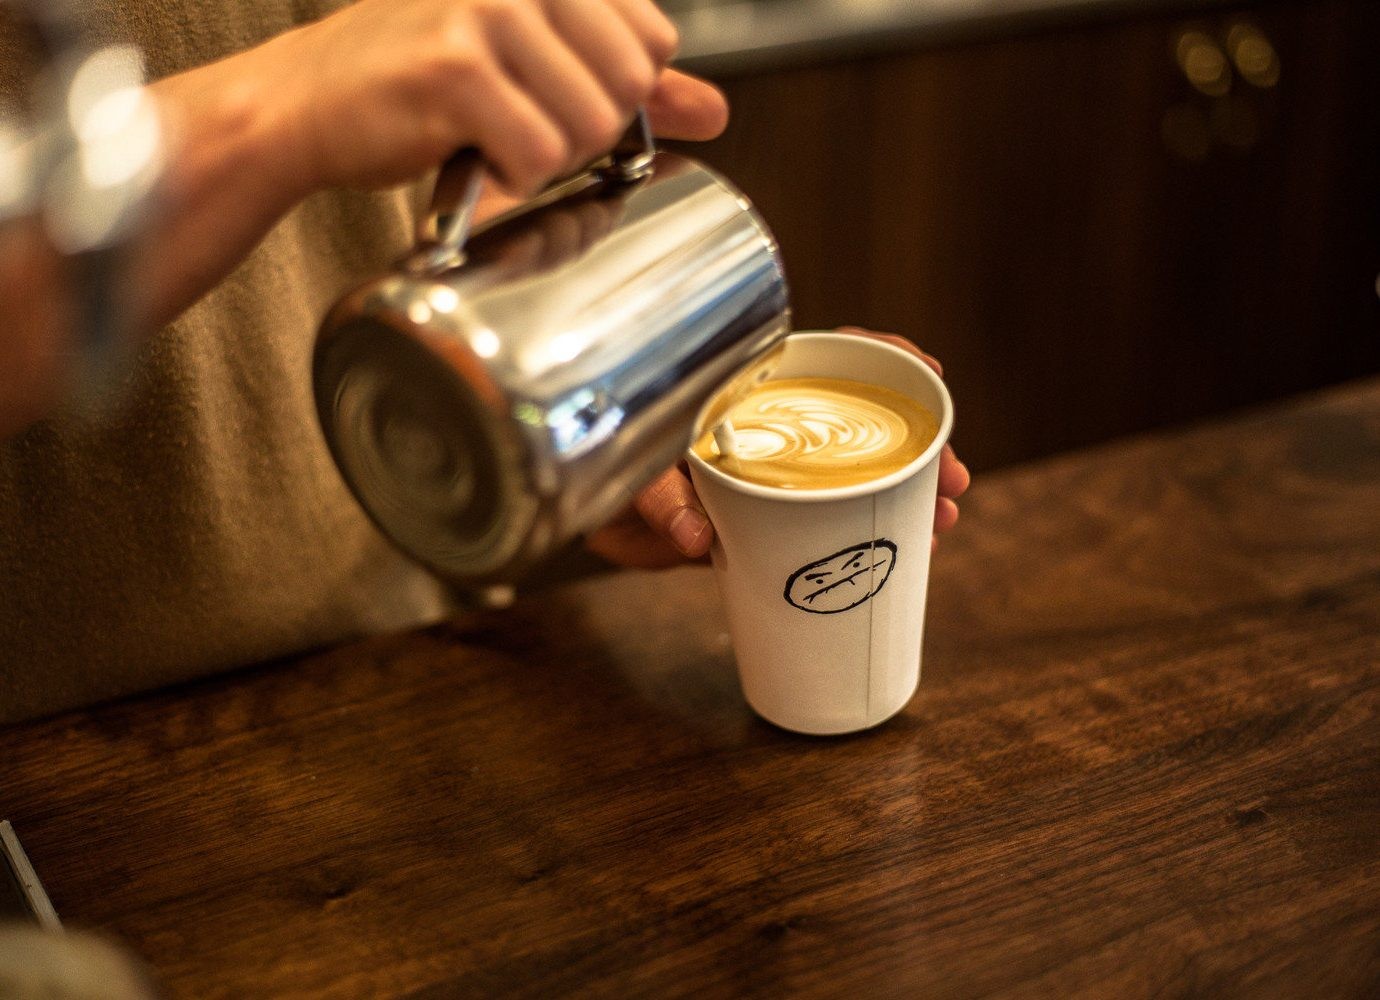 Offbeat cup table indoor person Drink coffee lighting espresso sense beer distilled beverage flavor drinking